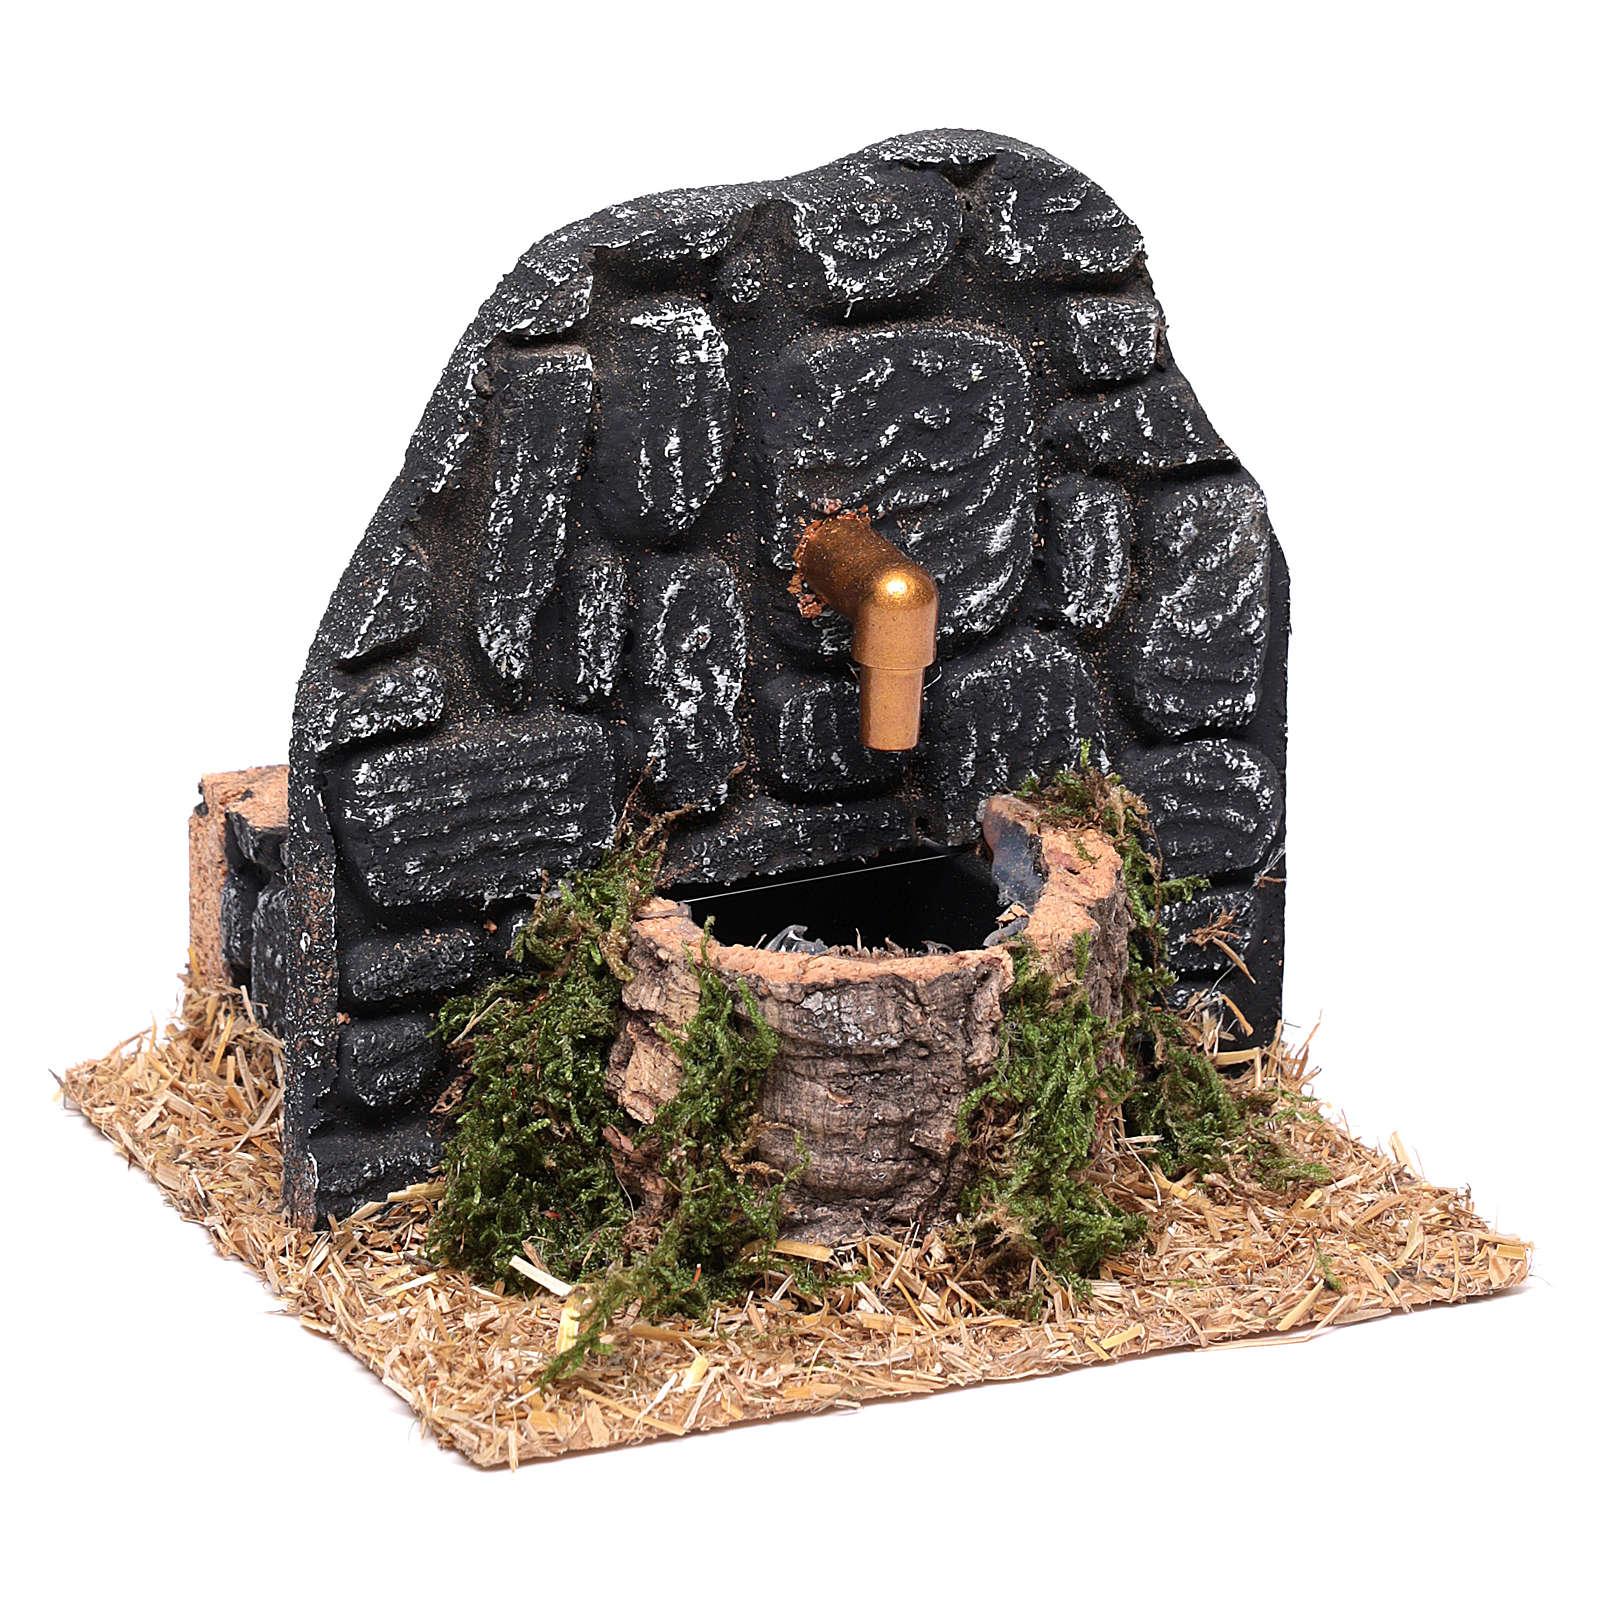 Chafariz com parede pedras escuras 15x15x15 cm 4